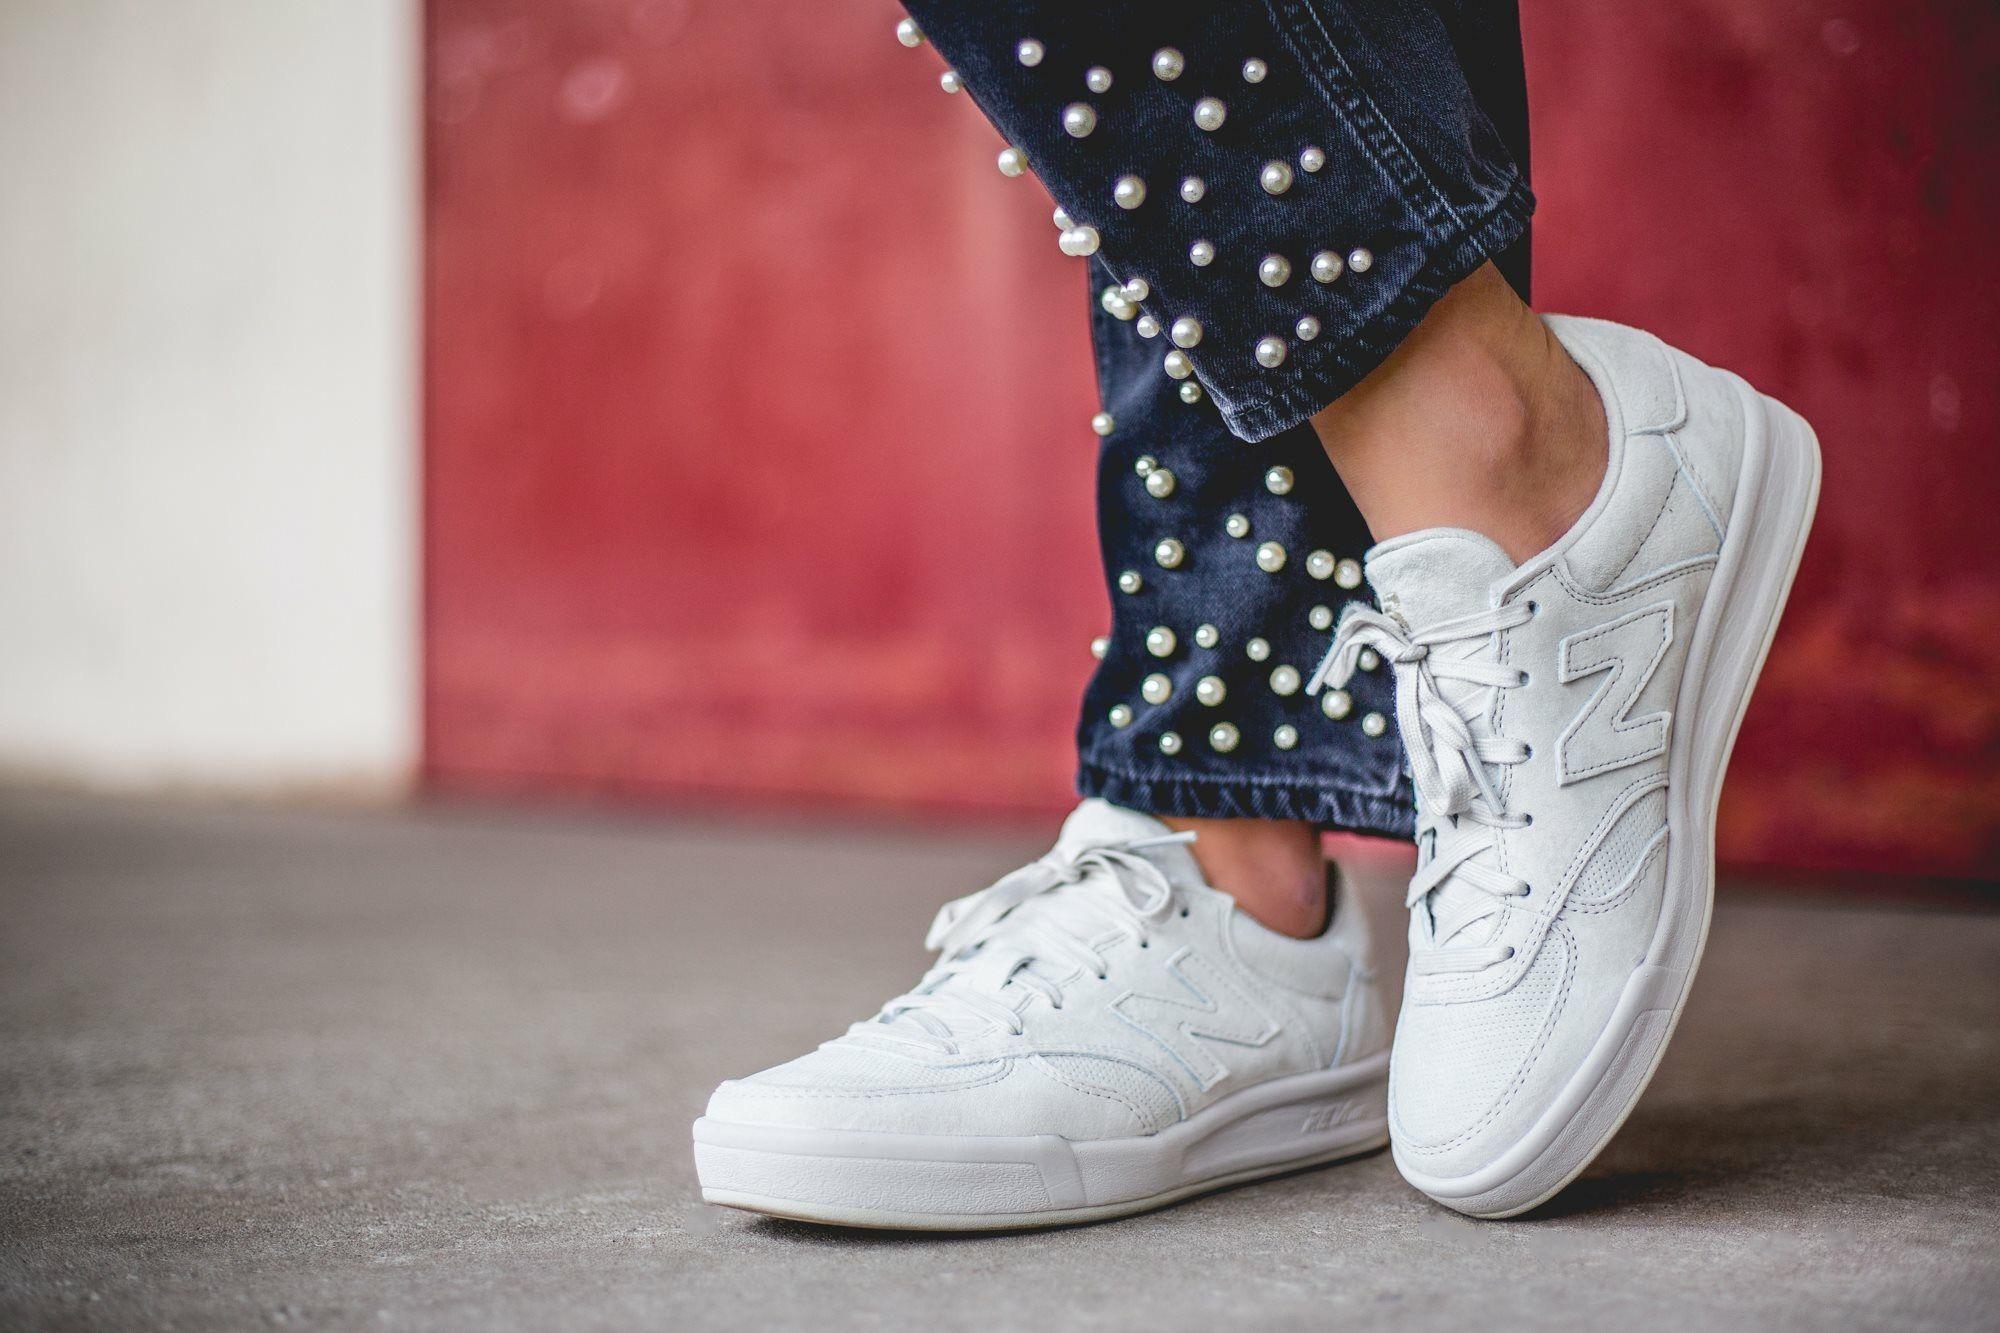 New Balance 300 | Sneakers, Sneaker stores, Tennis sneakers